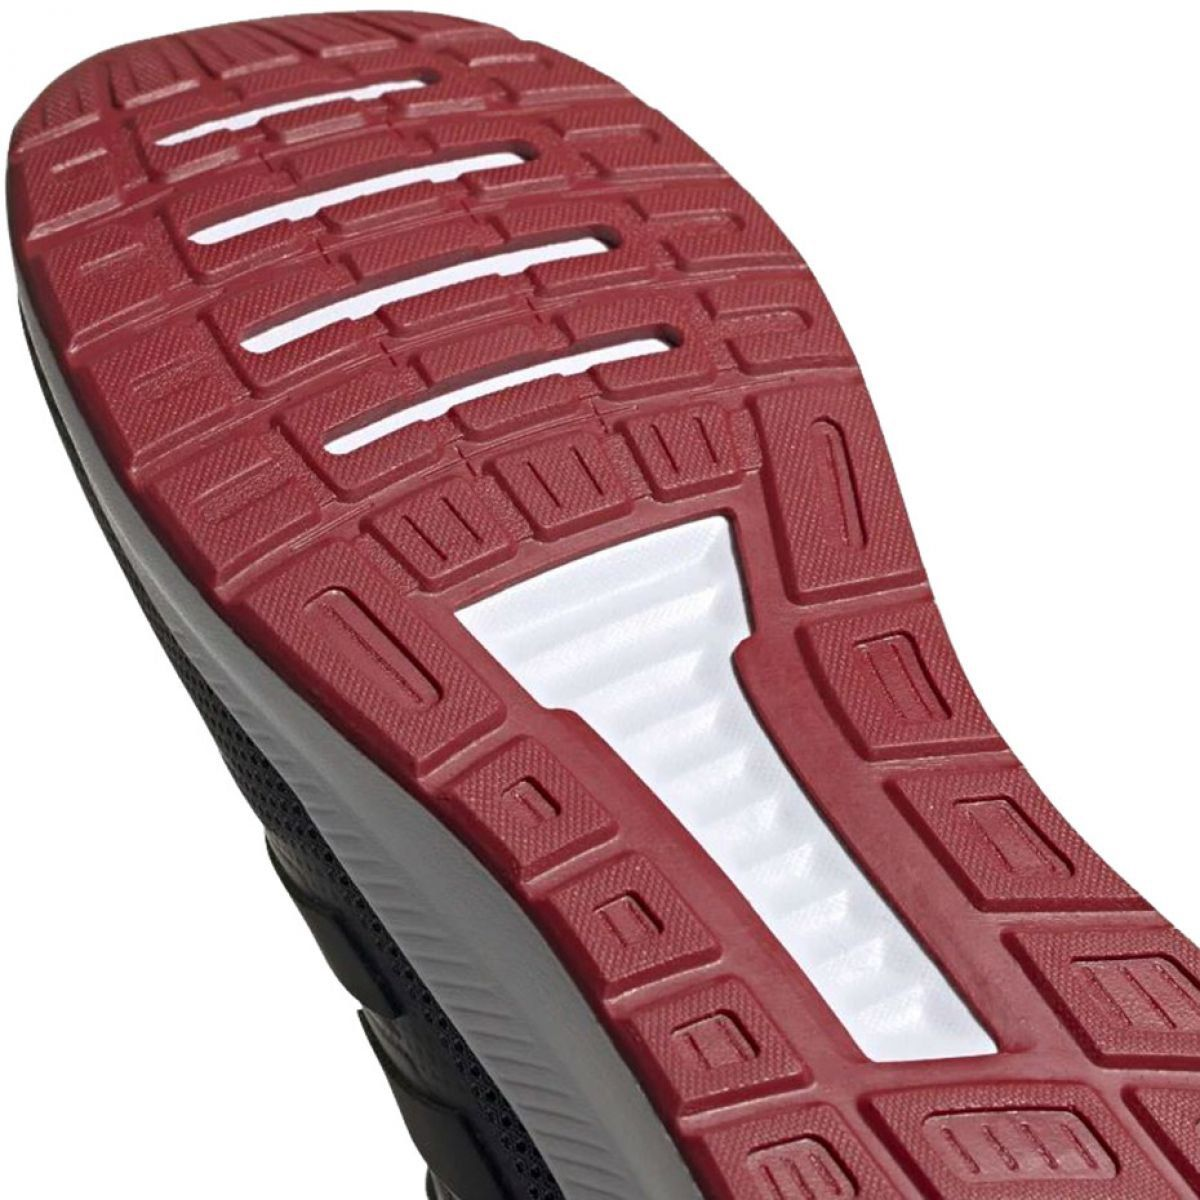 Buty Biegowe Adidas Runfalcon M Ee8153 Szare Bags Sling Backpack Adidas